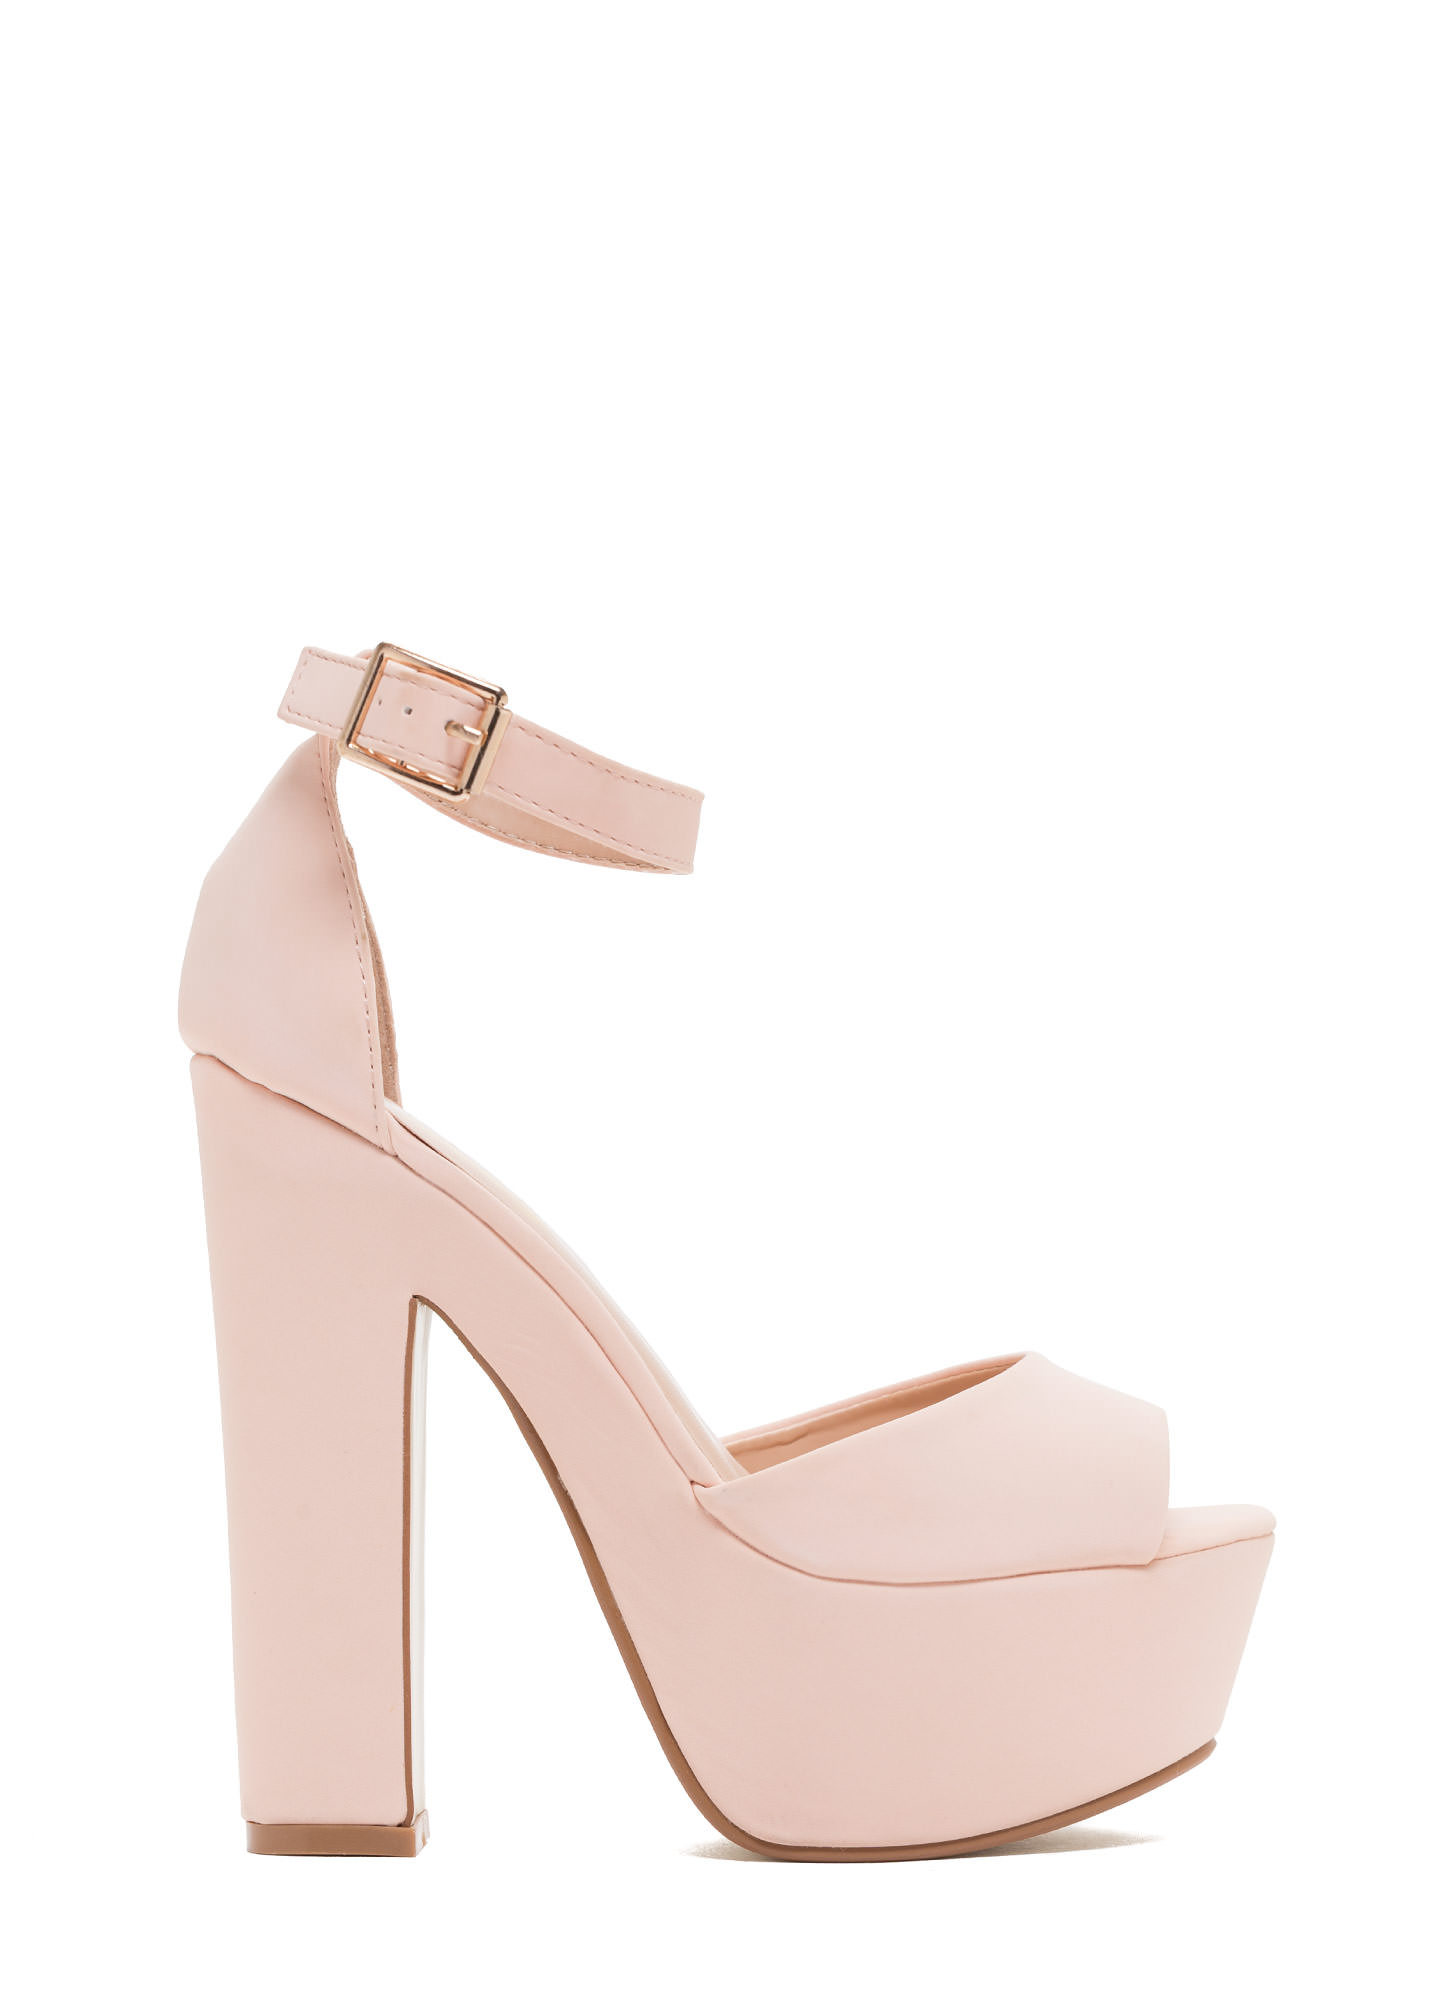 Wedding Blush Heels up high faux nubuck heels blush hotpink tan black gojane com way com